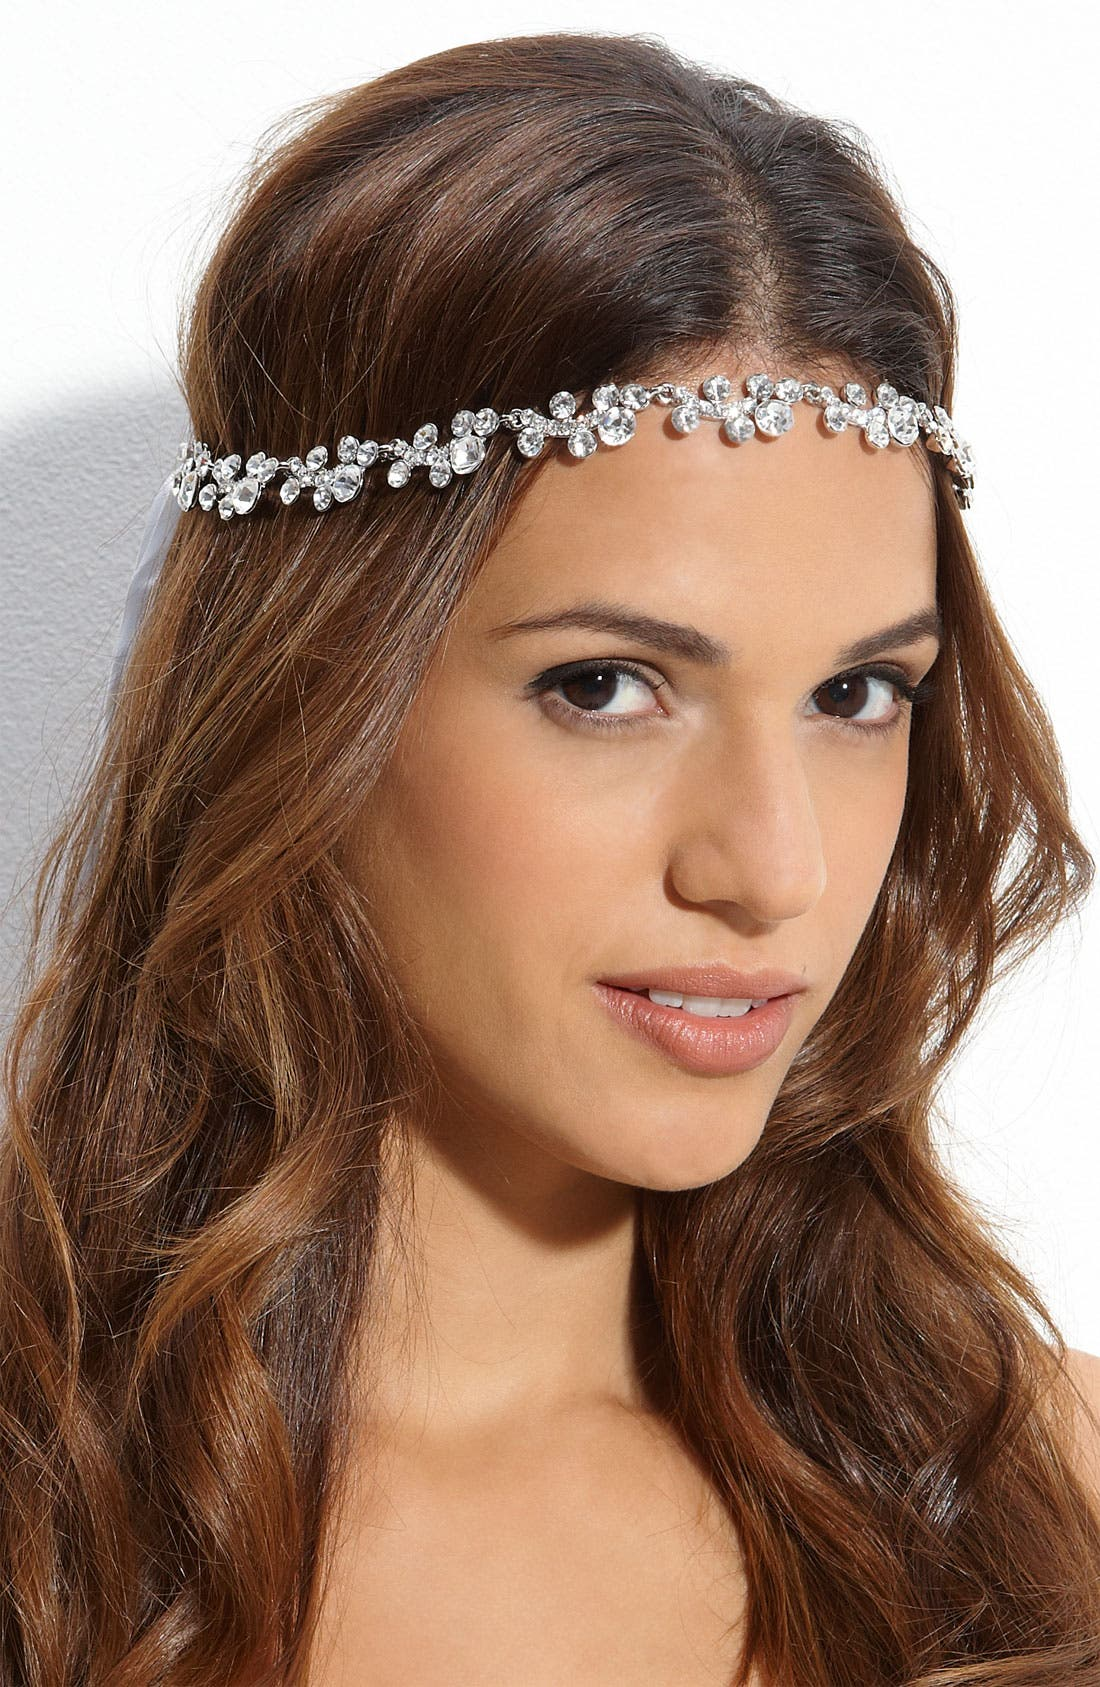 Alternate Image 1 Selected - Tasha 'Crystal Tiara' Head Wrap